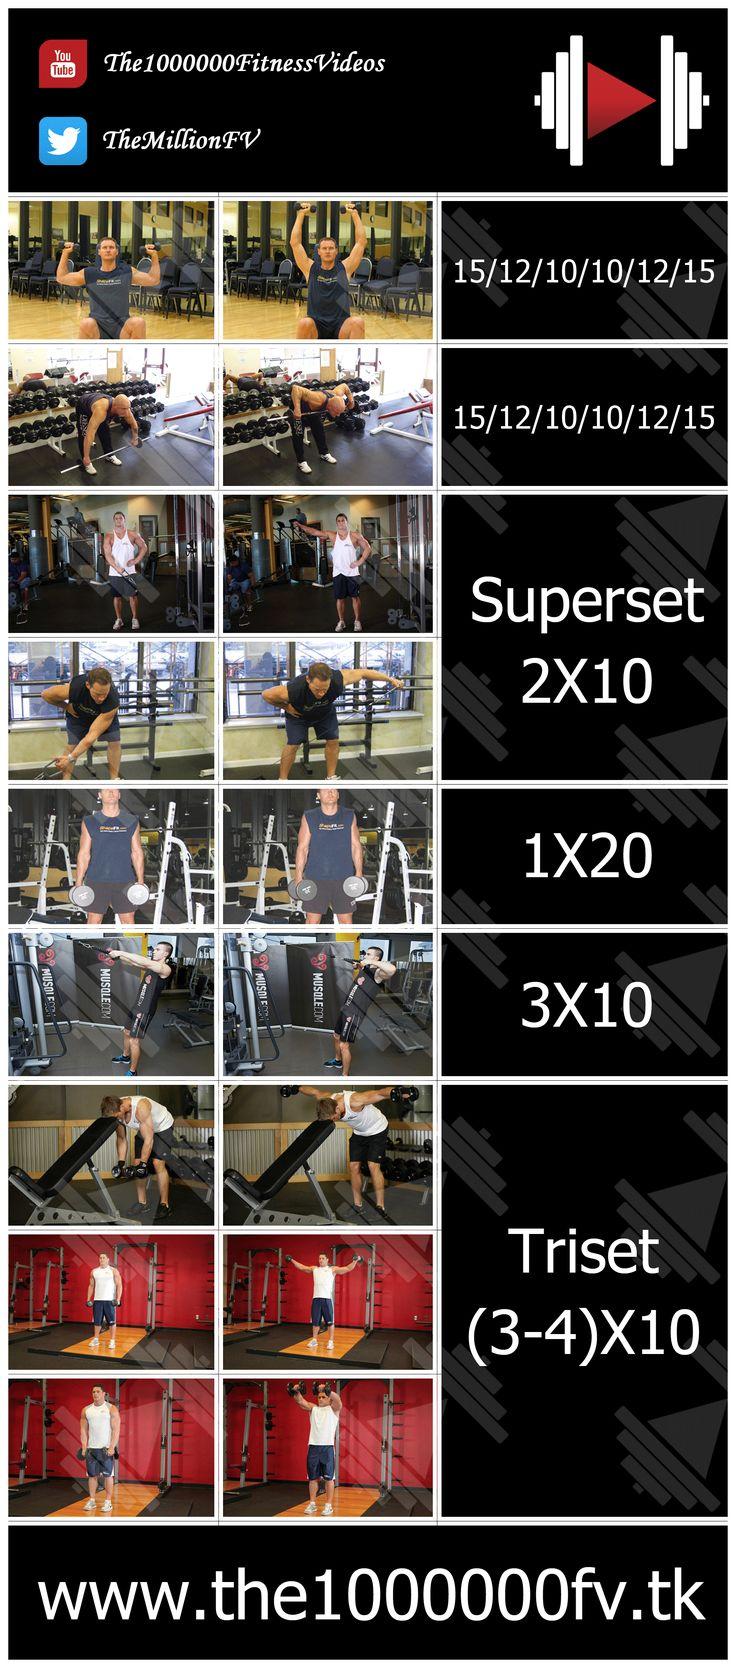 Shoulder workout for mass gain (intermediate level) #shoulder_workout #shoulder_workout_for_mass #shoulder_workout_for_the_gym #strengthening_shoulder #shoulder_workout_for_Beginners